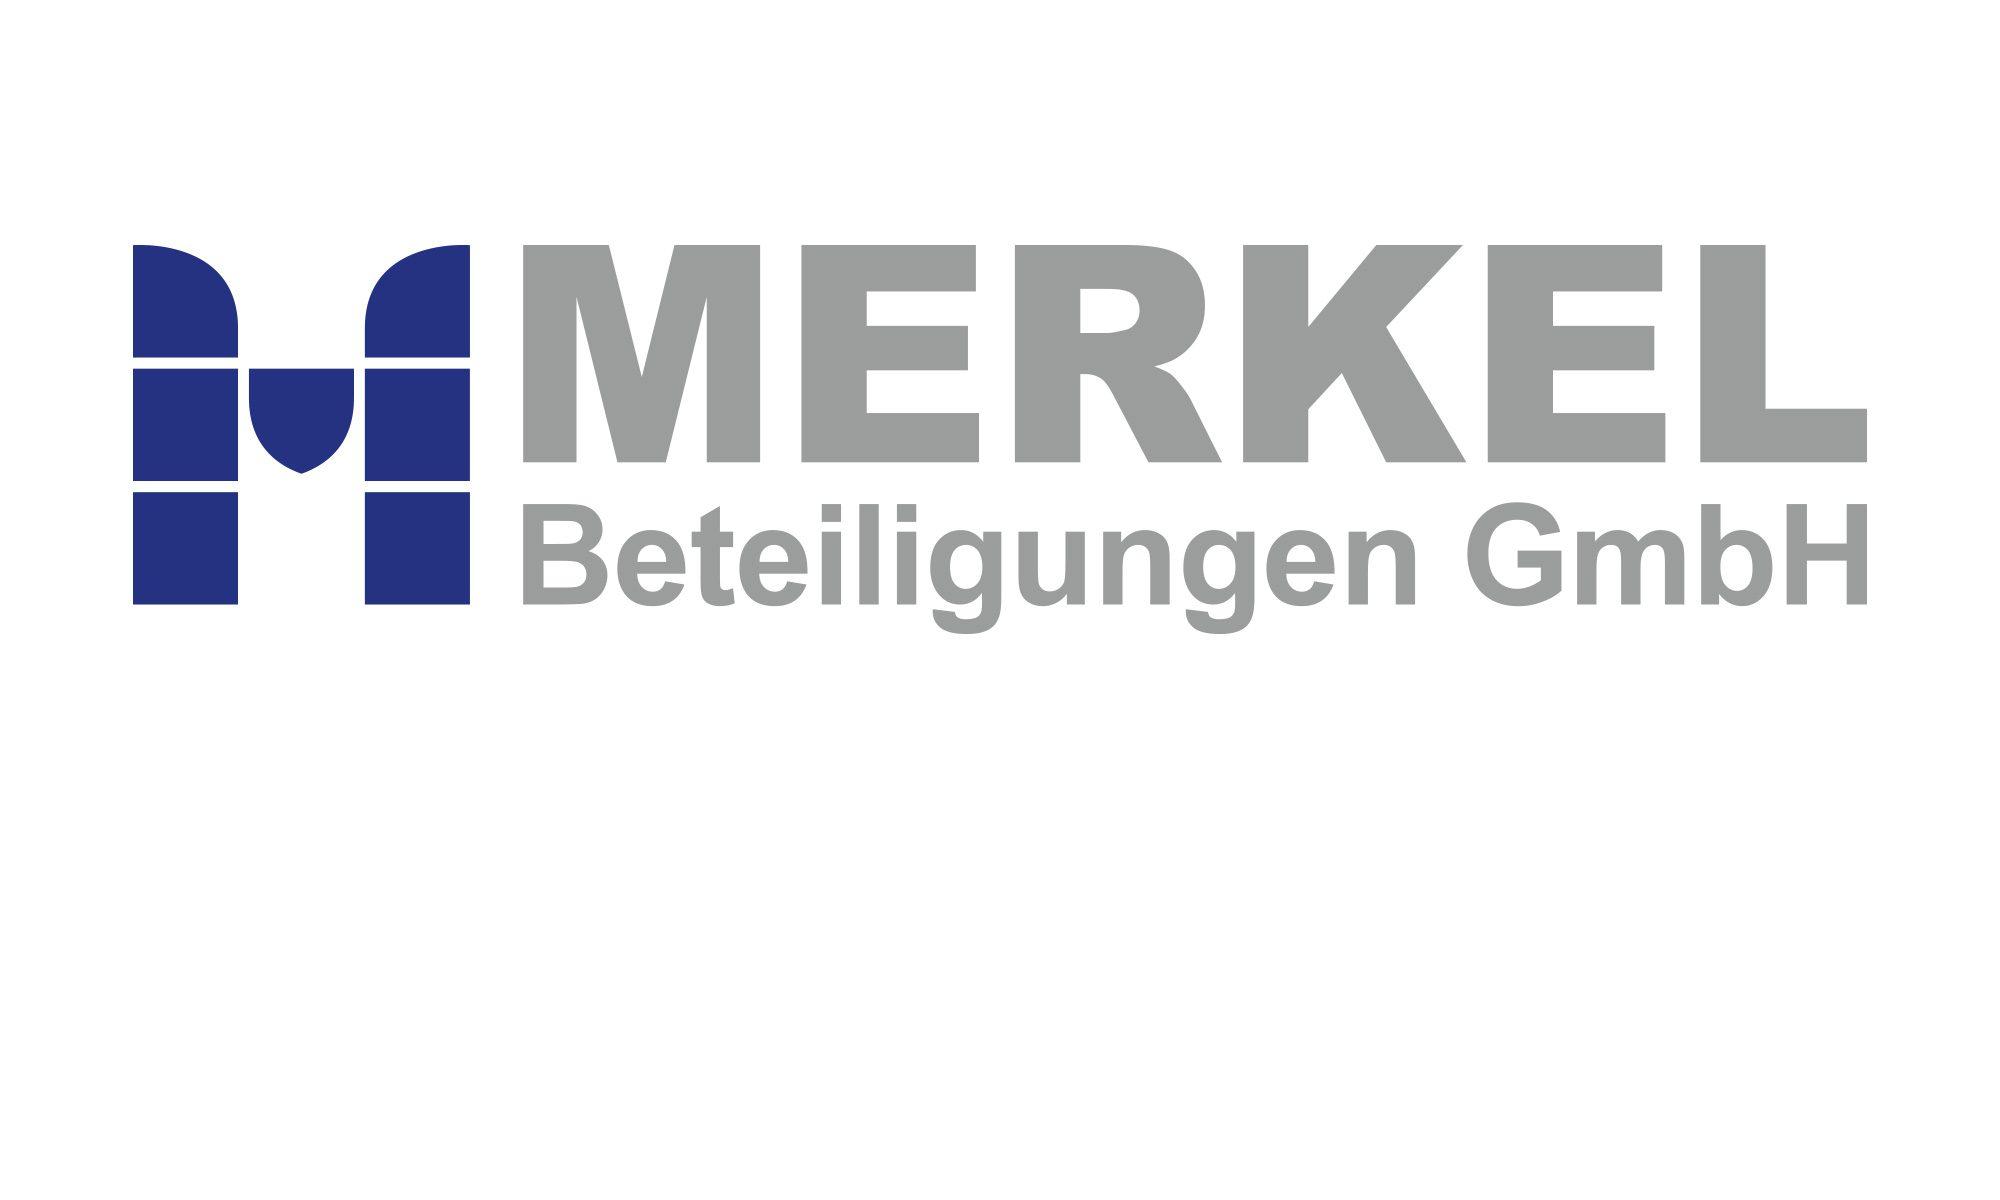 Merkel Beteiligungen GmbH